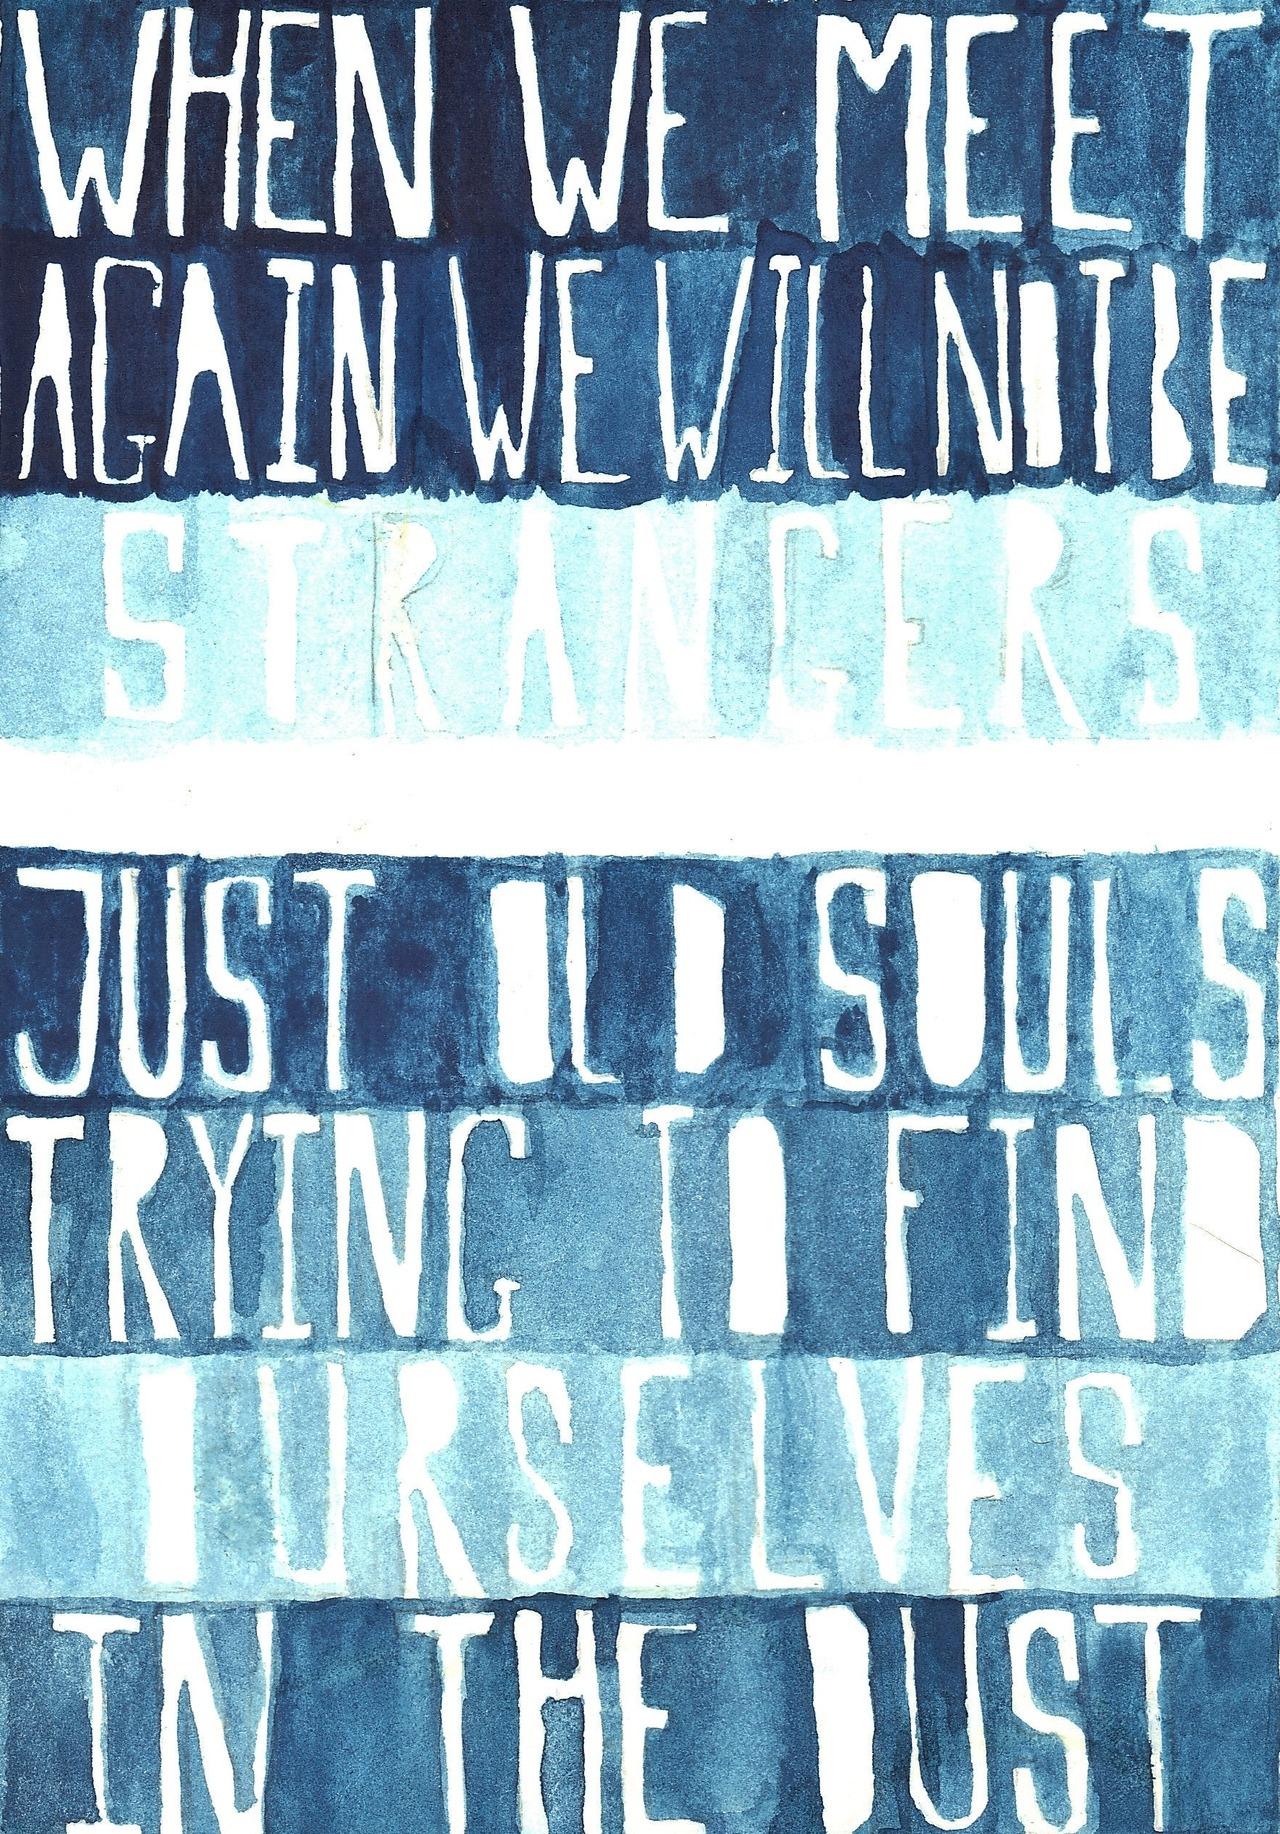 https://apodemialgia.tumblr.com/post/29307810663/okay-nick-gave-me-these-lyrics-because-hes-great